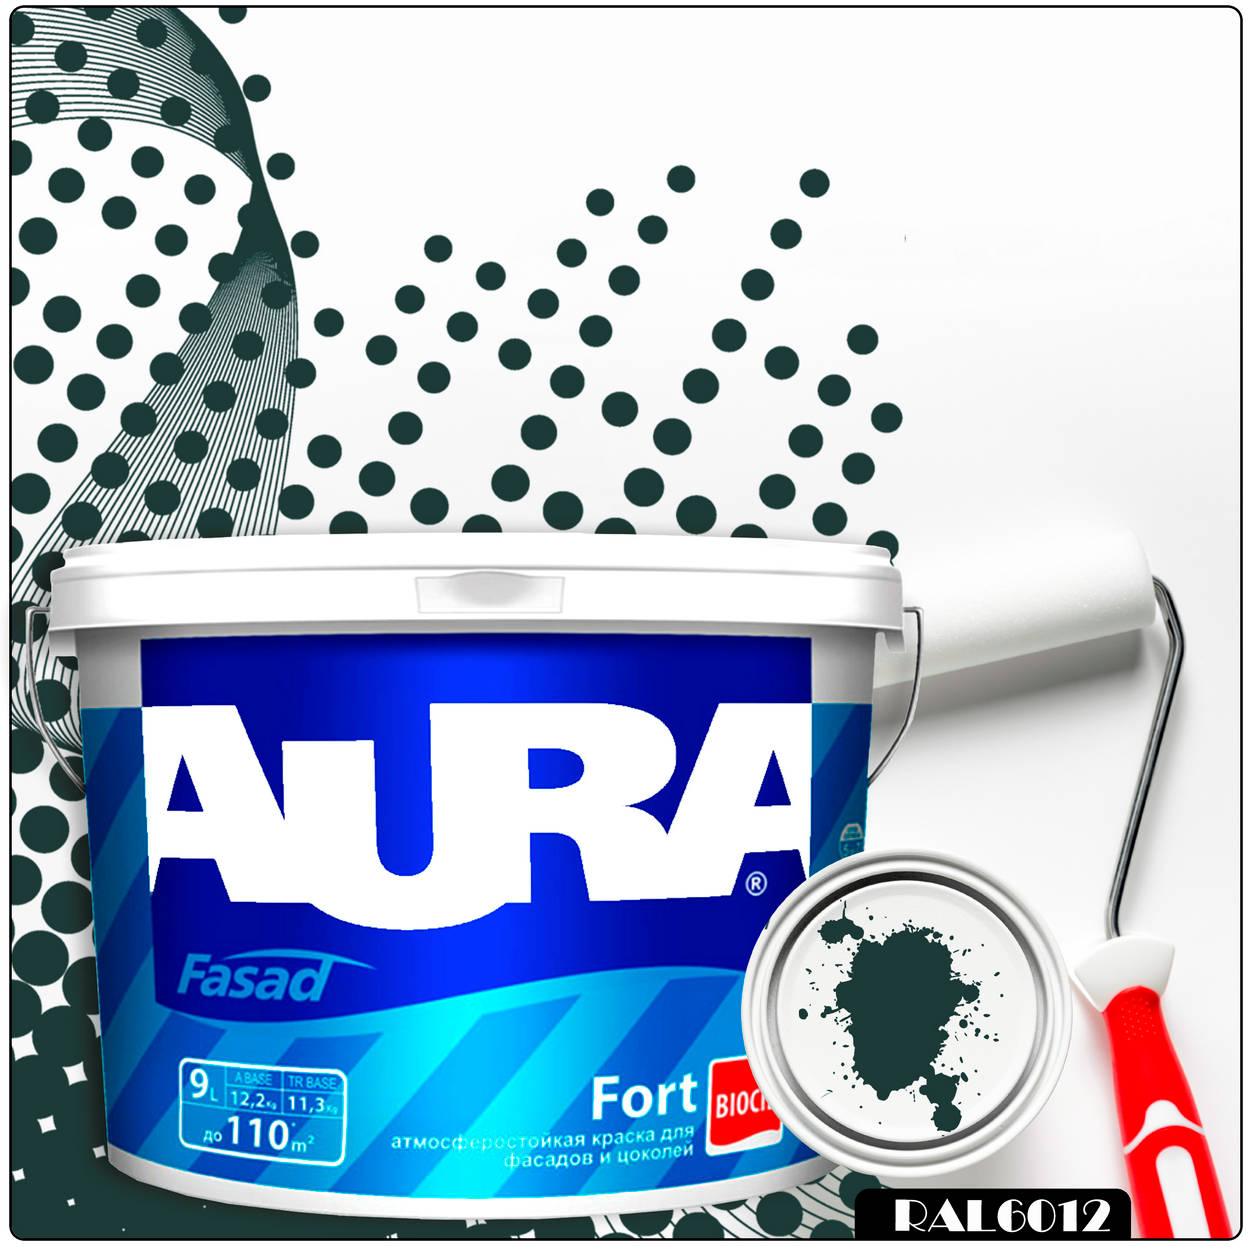 Фото 13 - Краска Aura Fasad Fort, RAL 6012 Чёрно-зелёный, латексная, матовая, для фасада и цоколей, 9л, Аура.